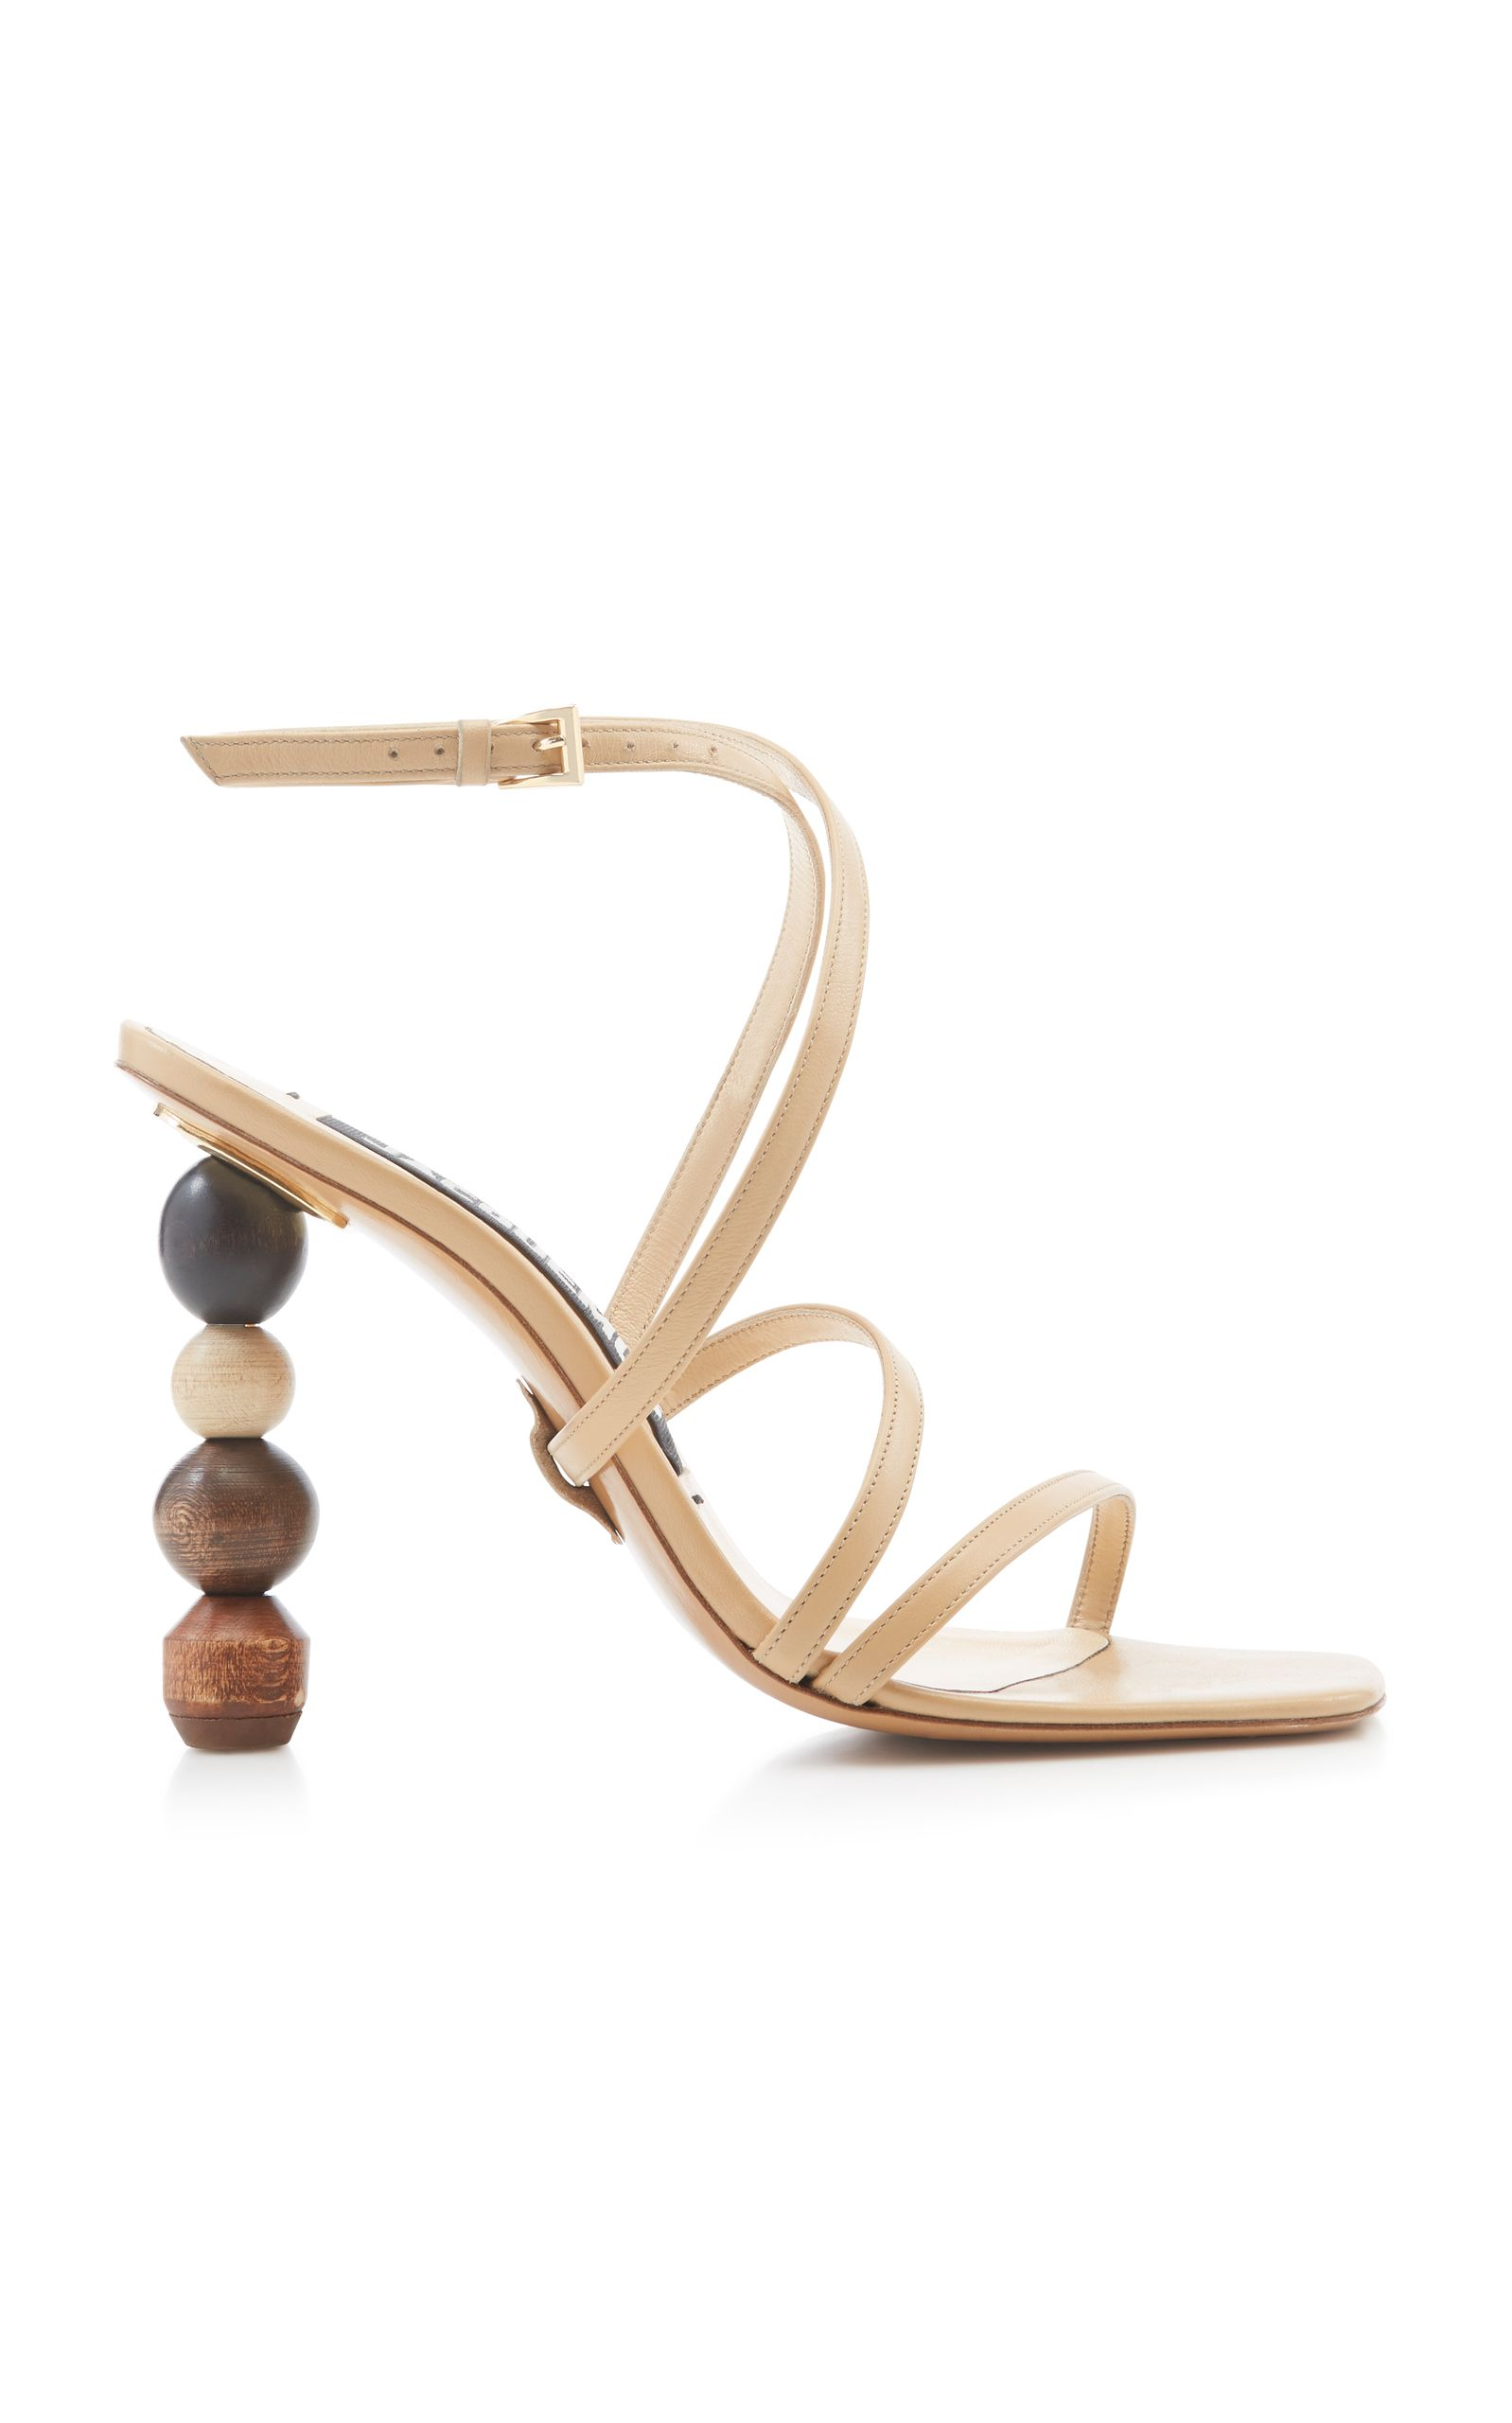 3713ae31128 JACQUEMUS RUMBA SANDAL.  jacquemus  shoes